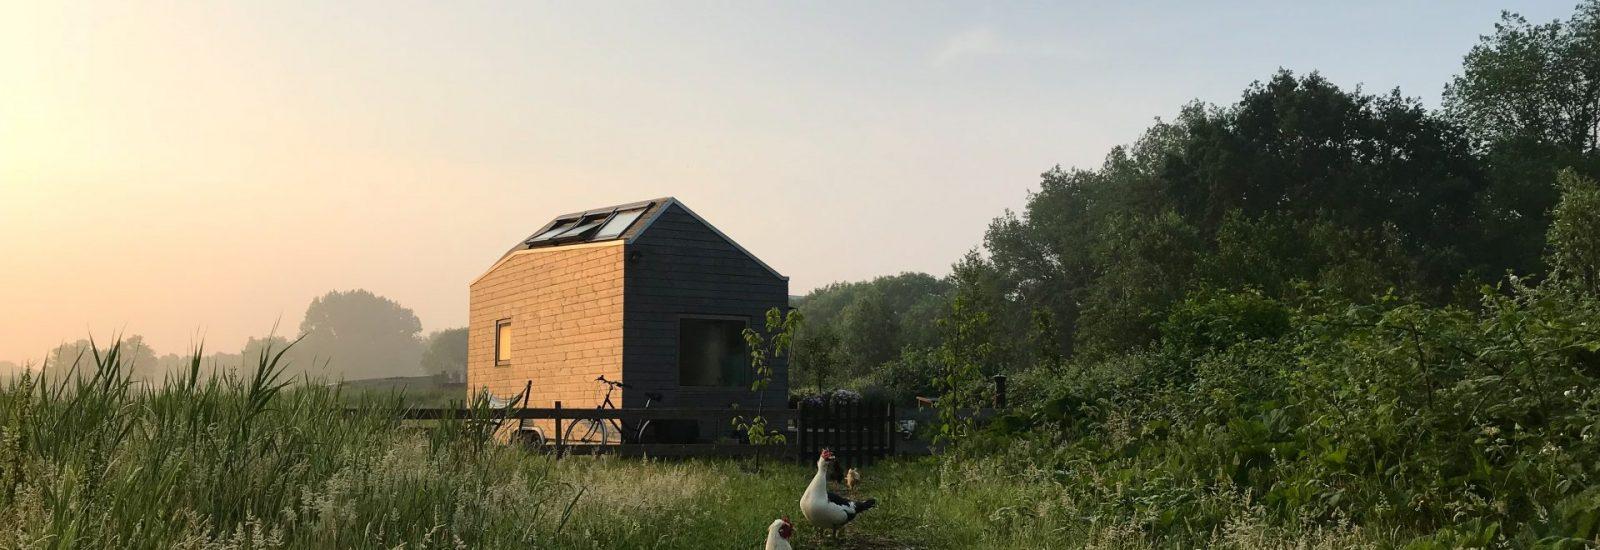 tiny house nederland